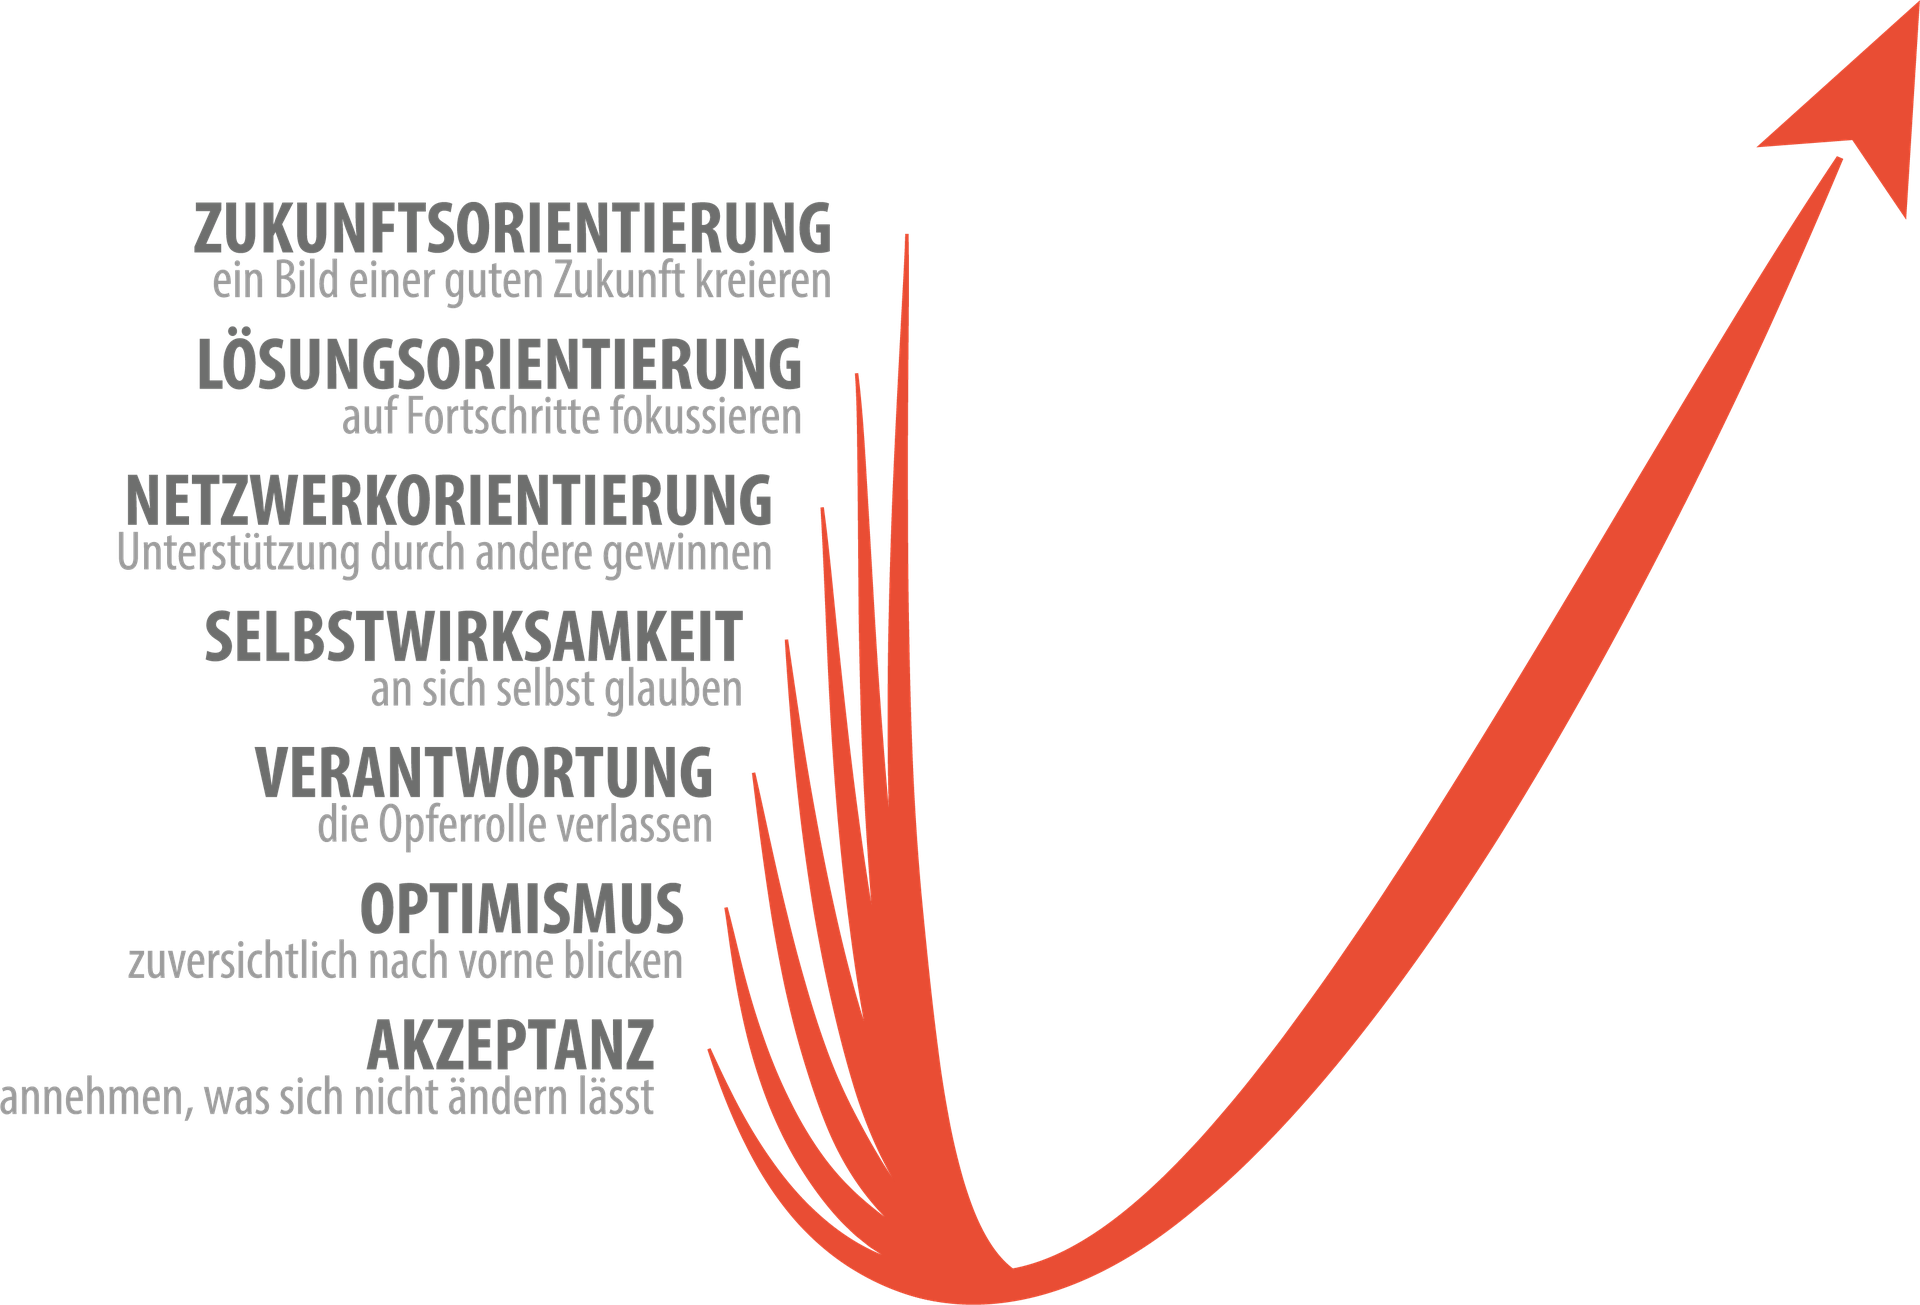 Was ist Resilienz? - Coachingzentrum Heidelberg - Seminare